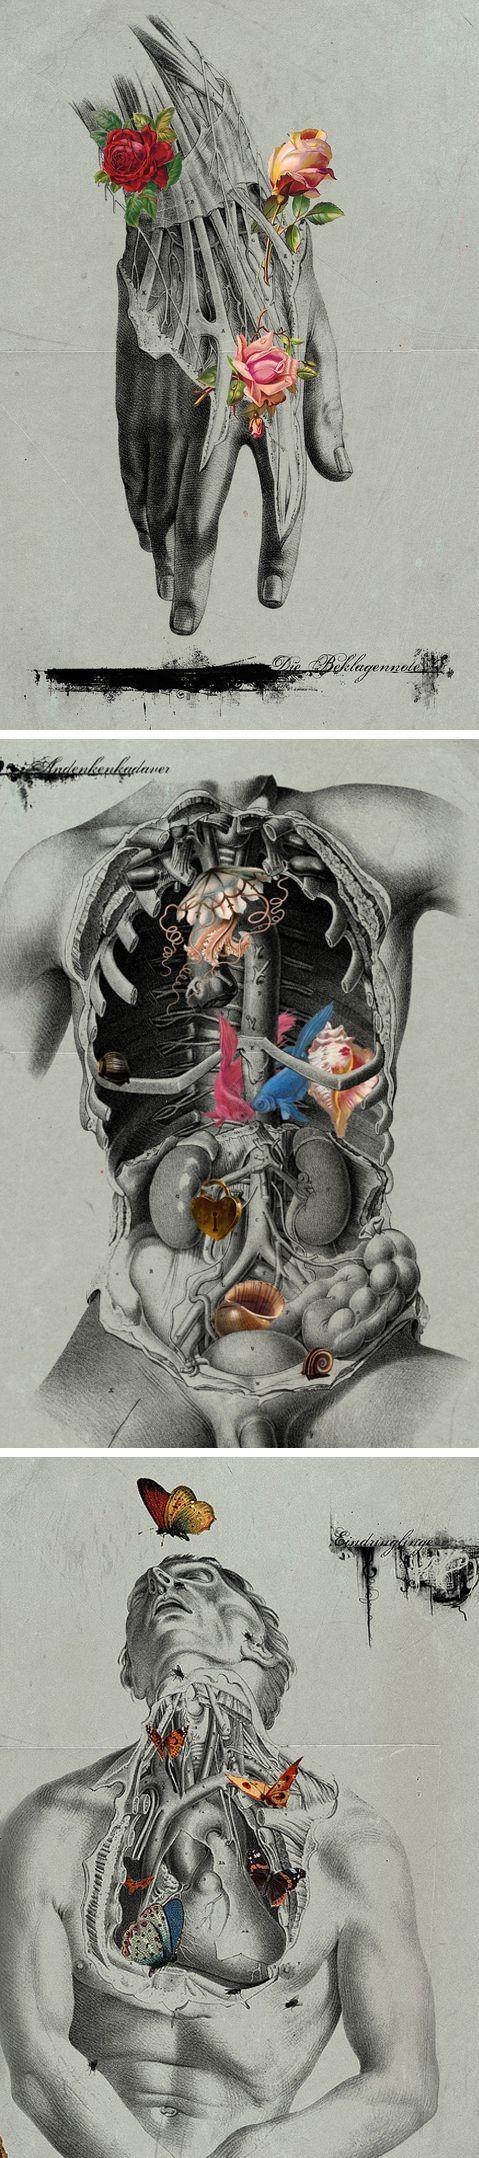 Michele Parliament: colagens/anatomia